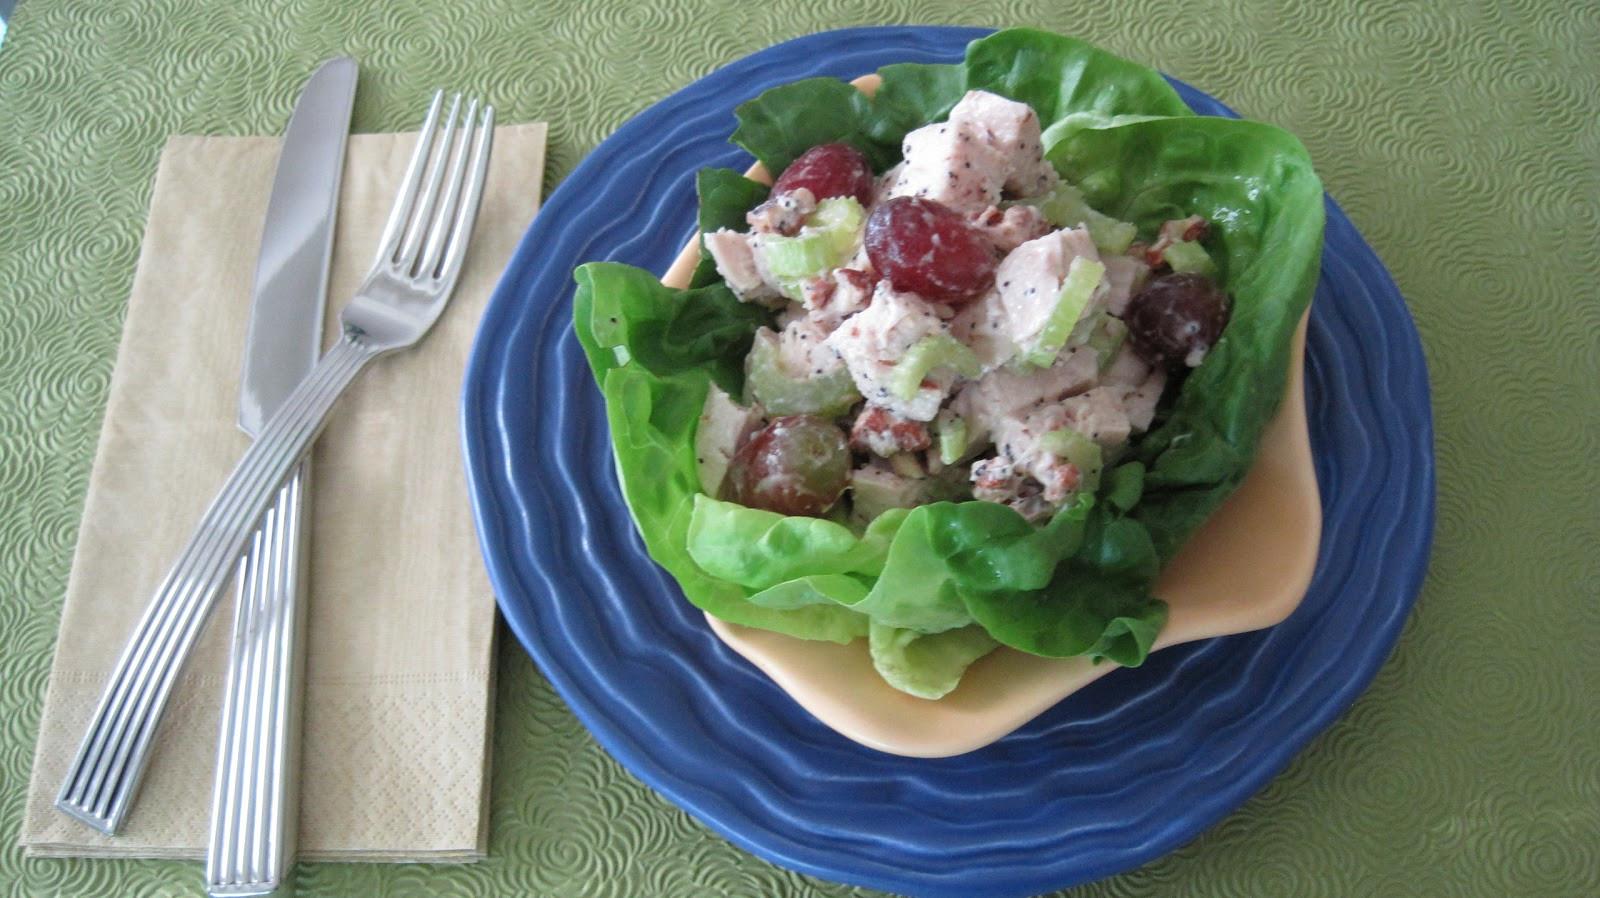 Sonoma Chicken Salad  Sonoma Chicken Salad At Home with Vicki Bensinger